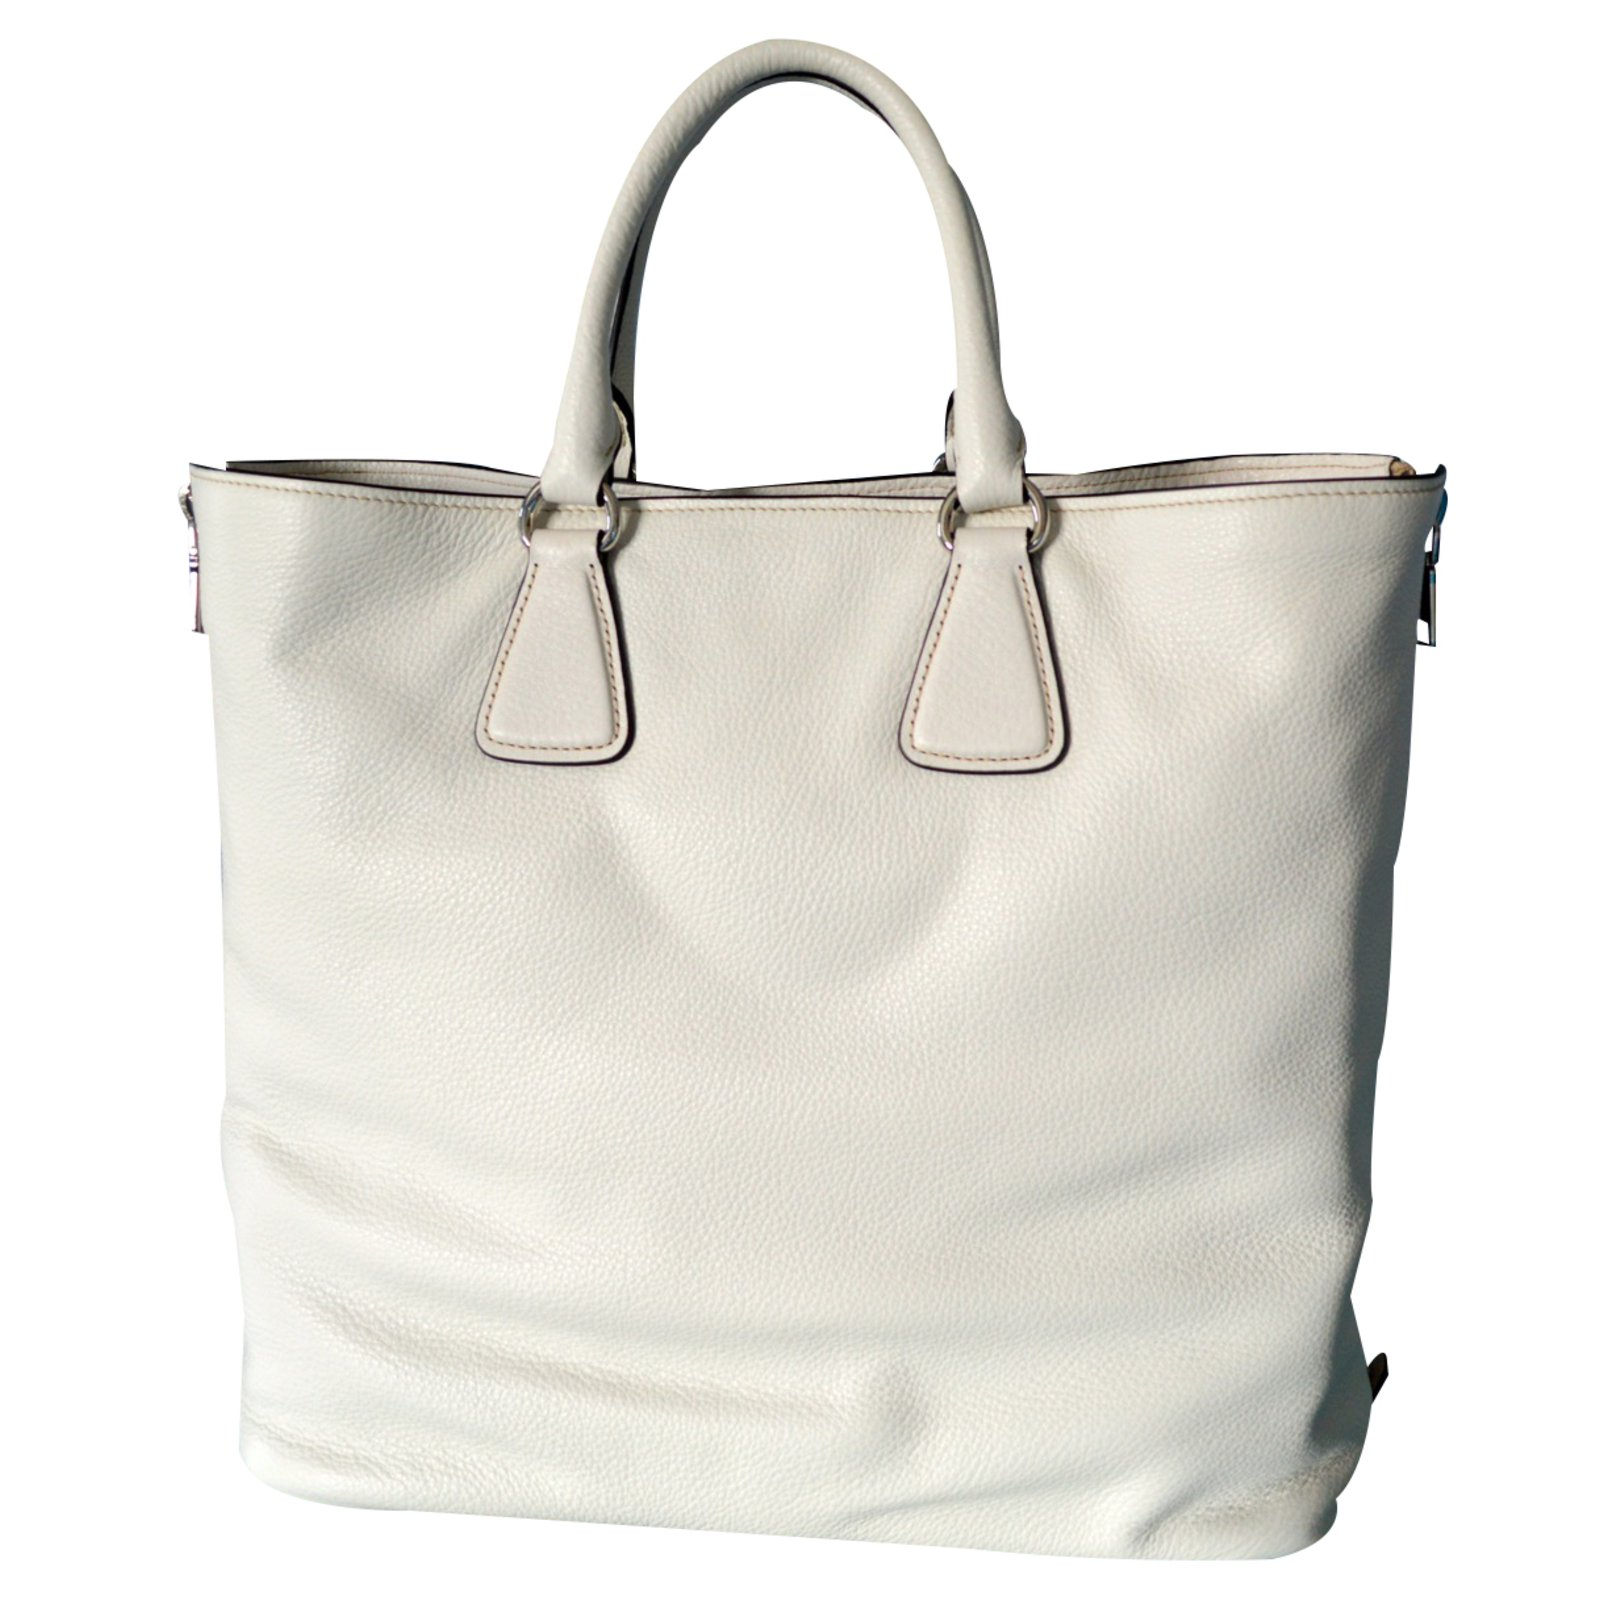 ... Prada Prada vitello phenix talco textured leather shopping tote bag  bn2419 original Handbags Leather White ref ... 9c342cad44